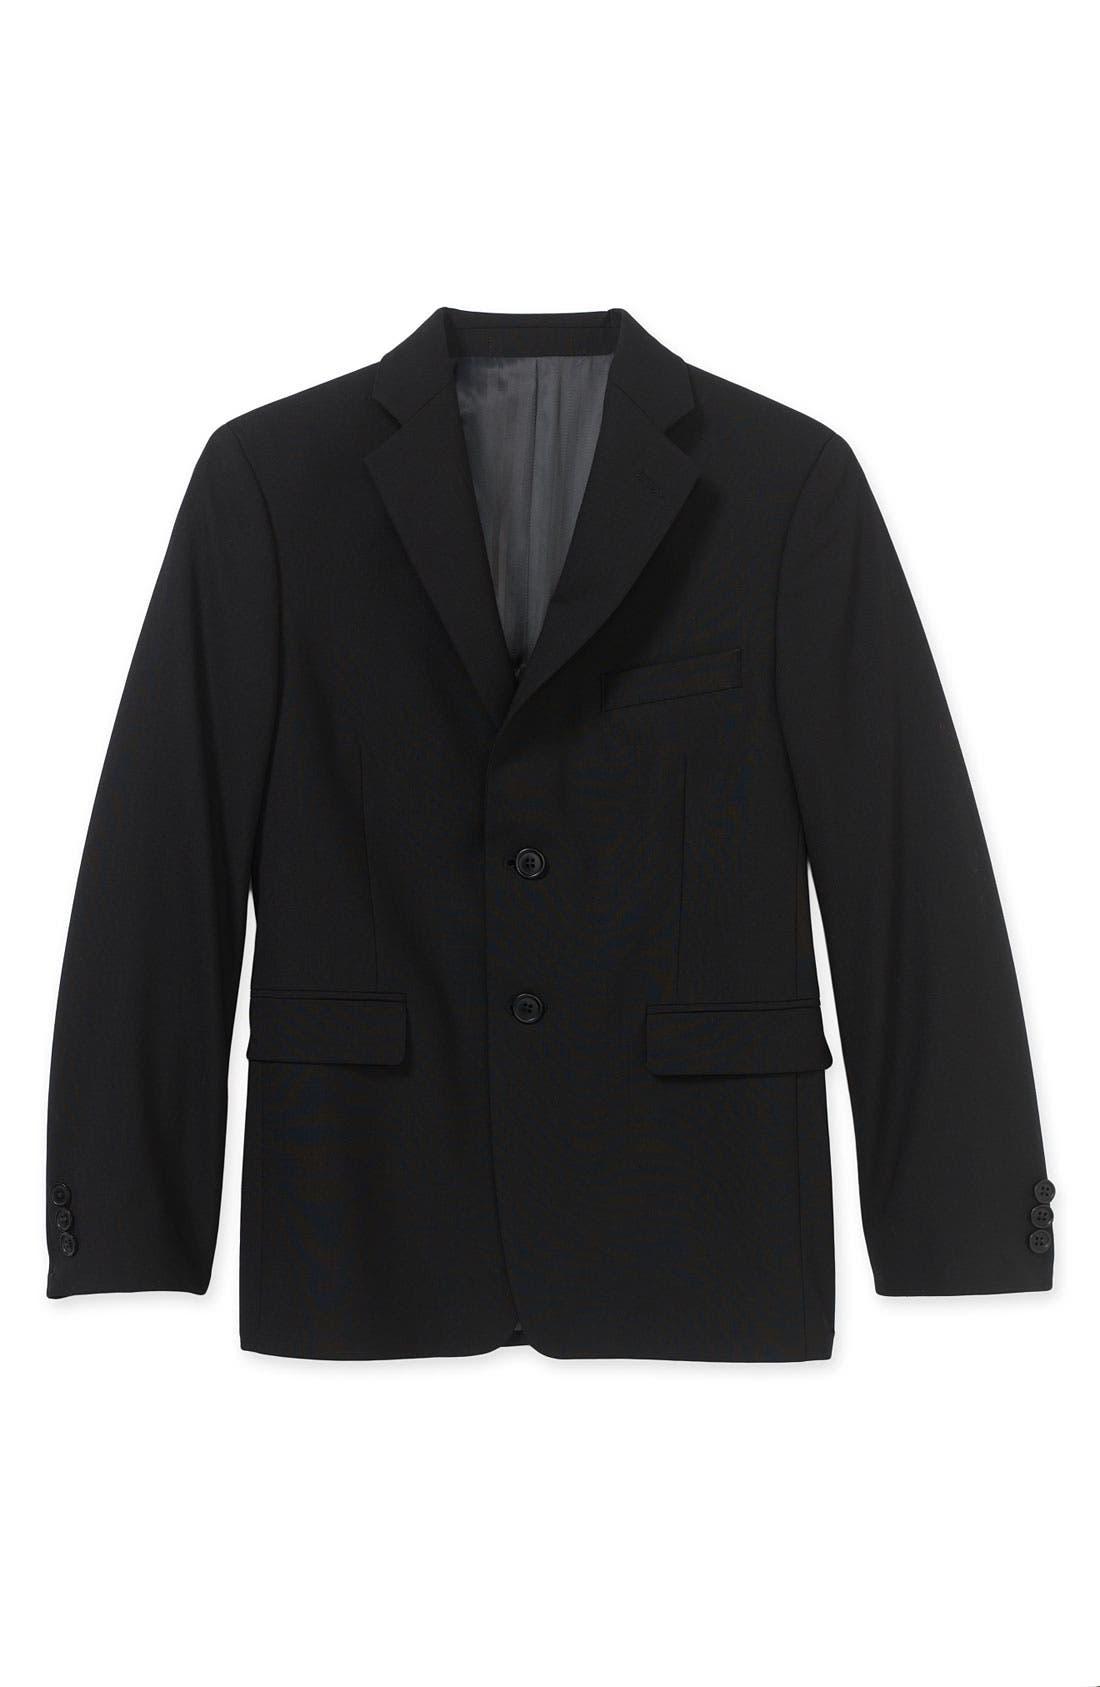 Alternate Image 1 Selected - Joseph Abboud Suit Blazer (Little Boys, Big Boys & Husky)